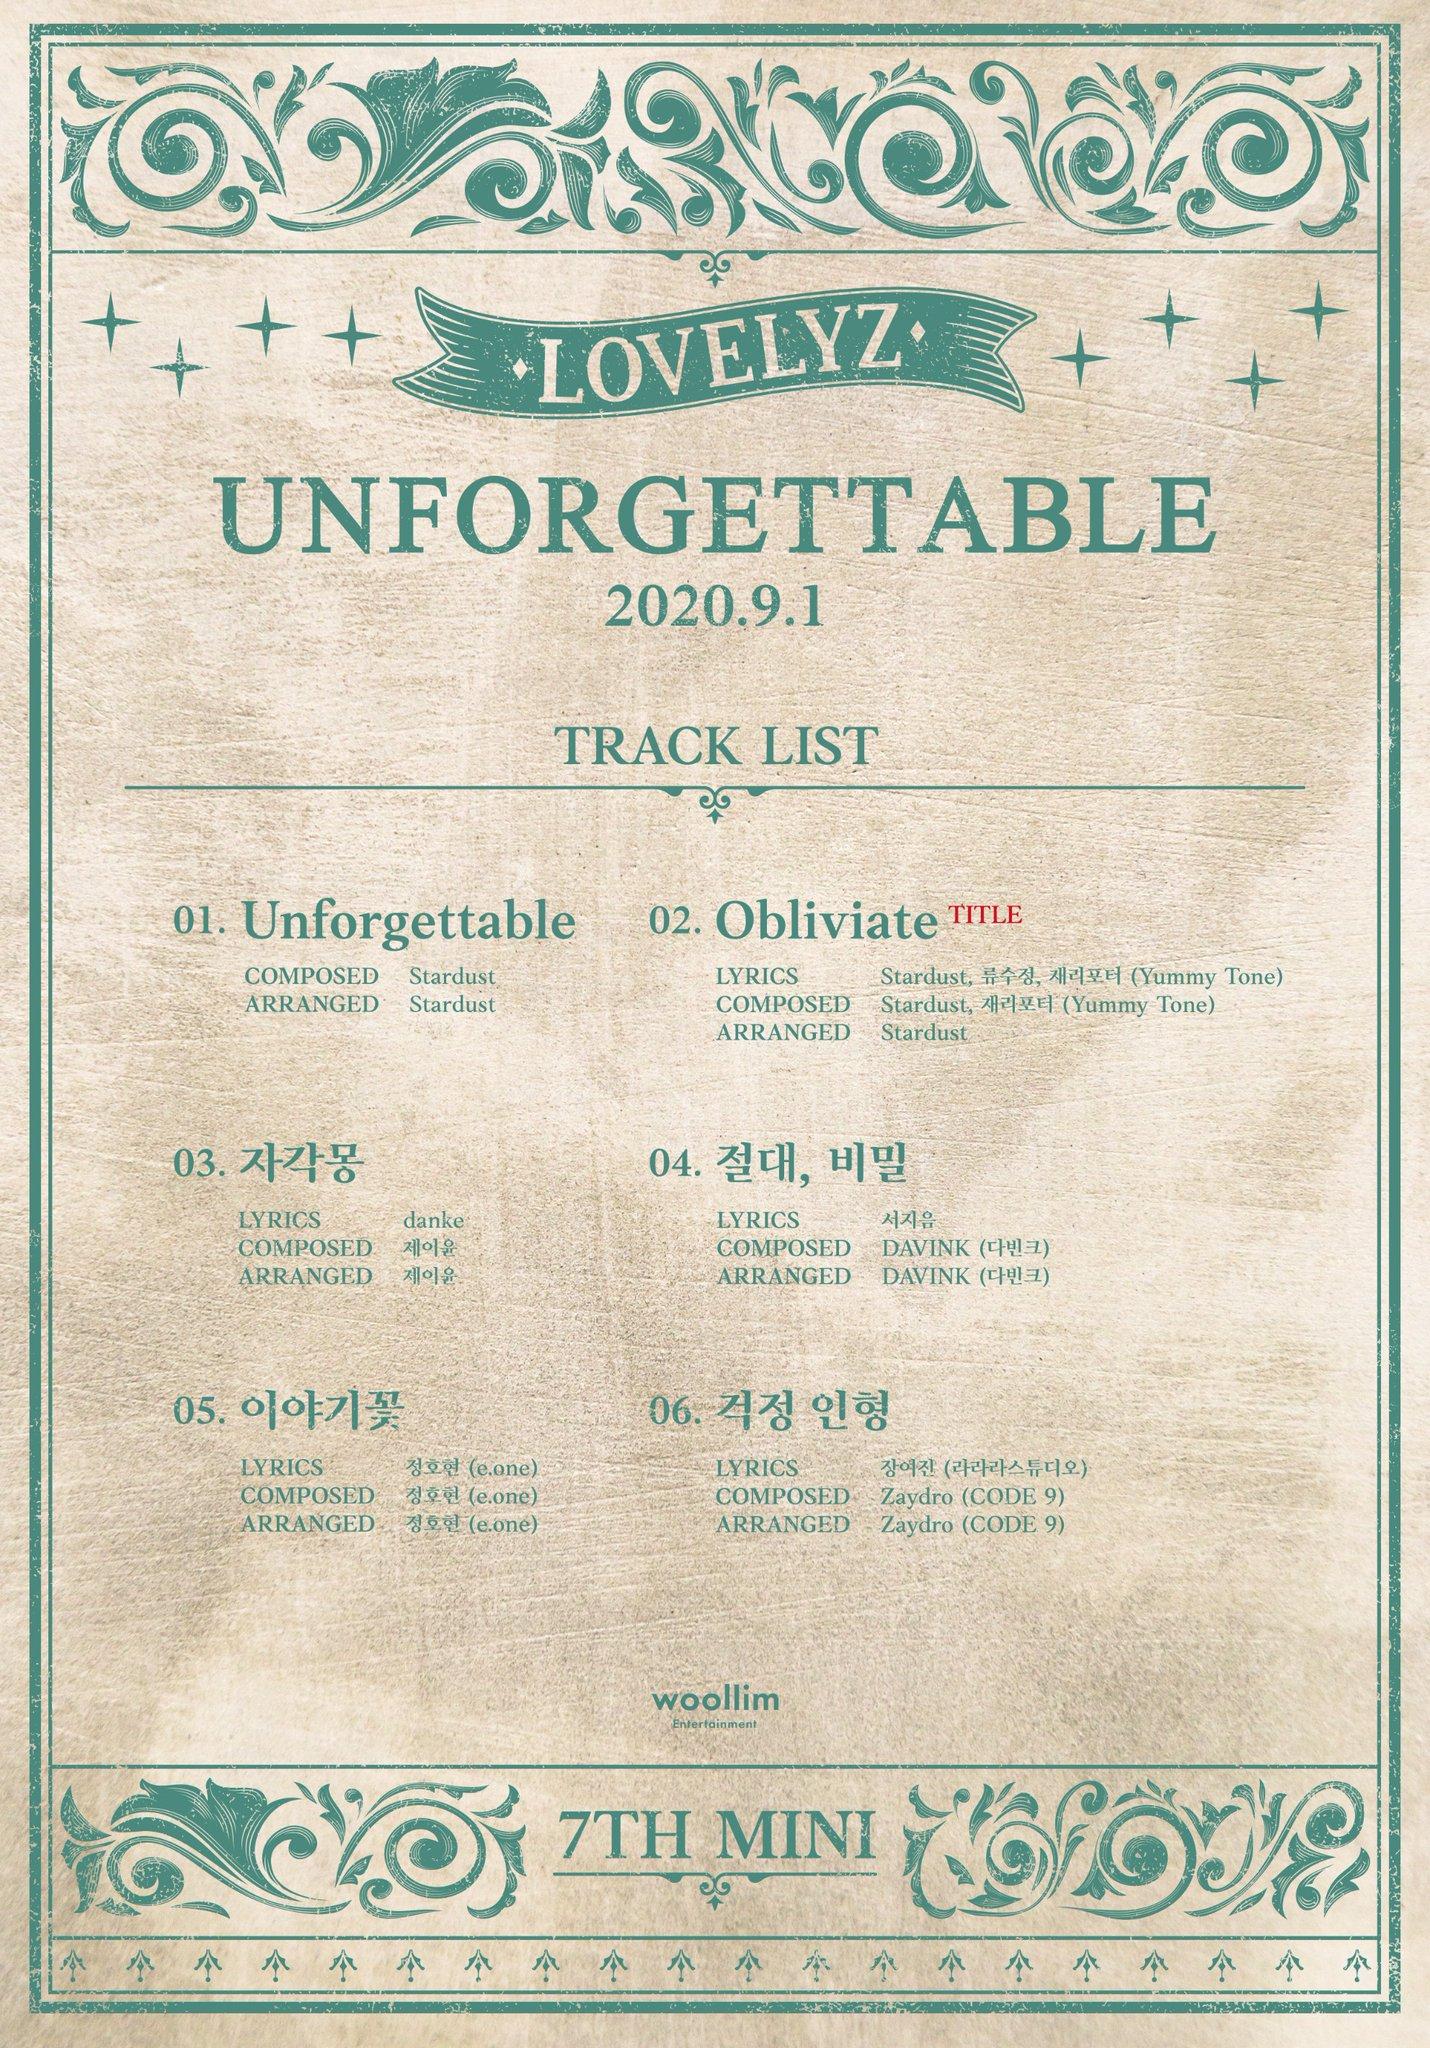 Lovelyz Track List